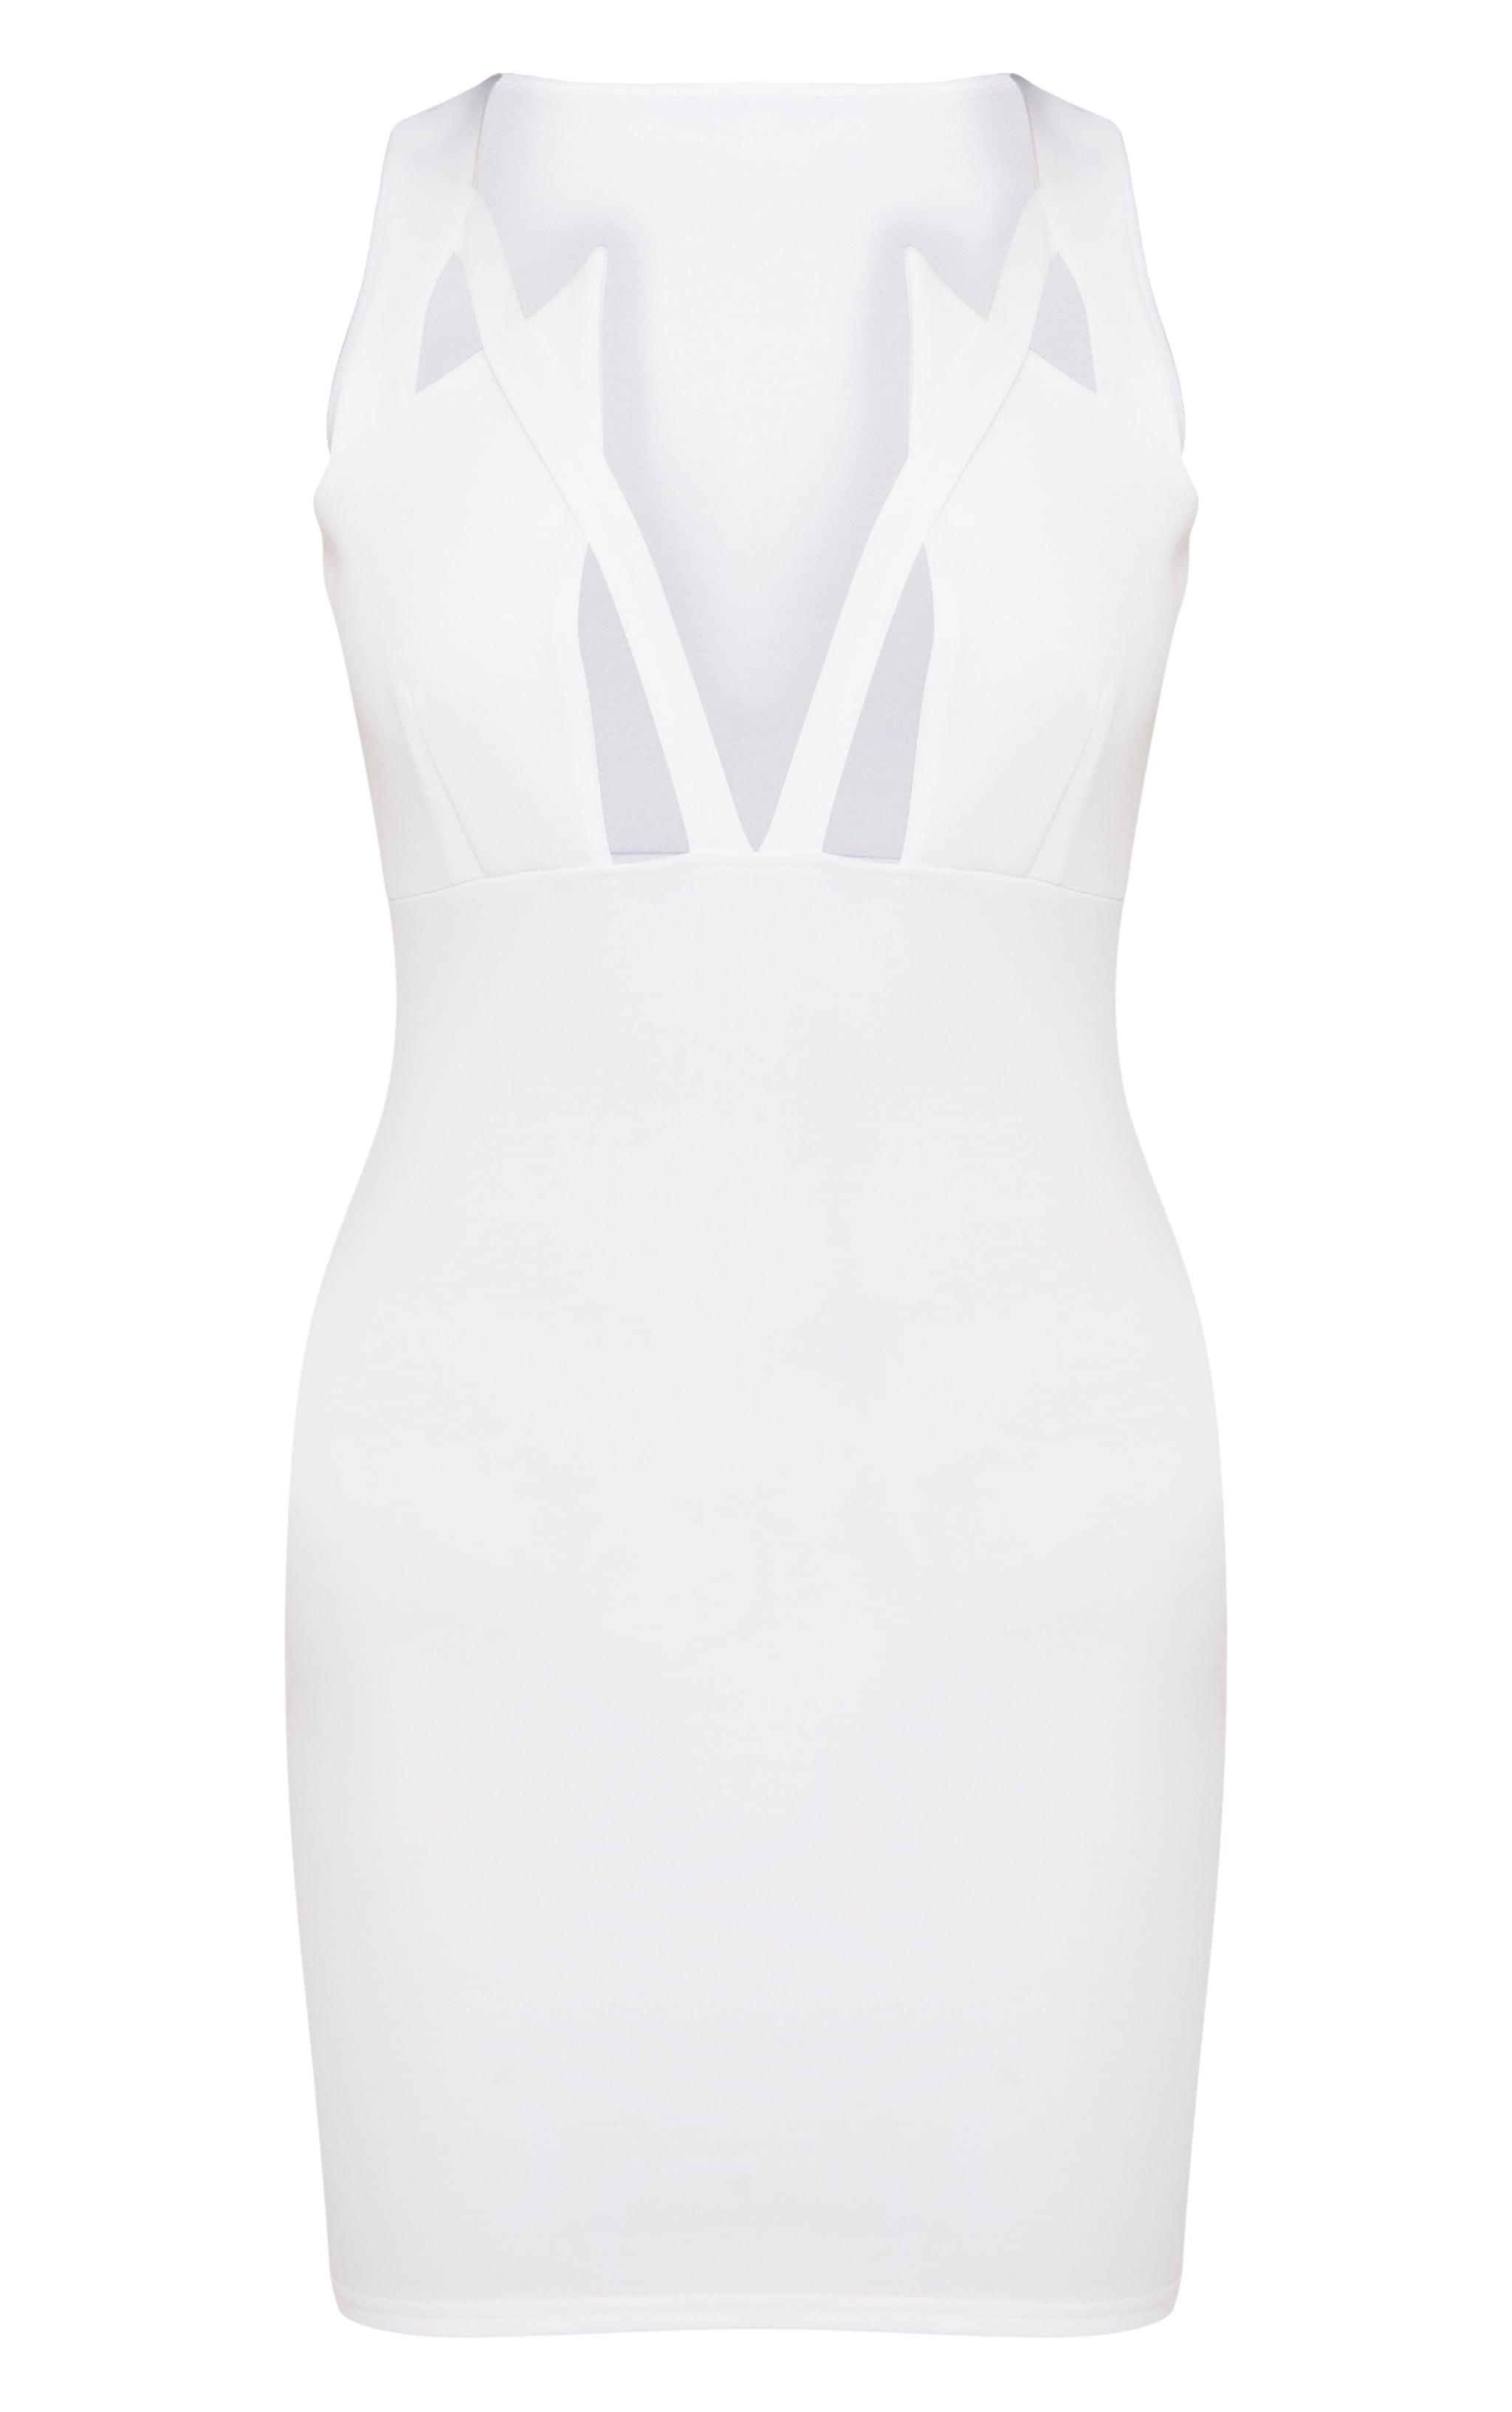 White Scuba Sleeveless Cut Out Plunge Bodycon Dress 3